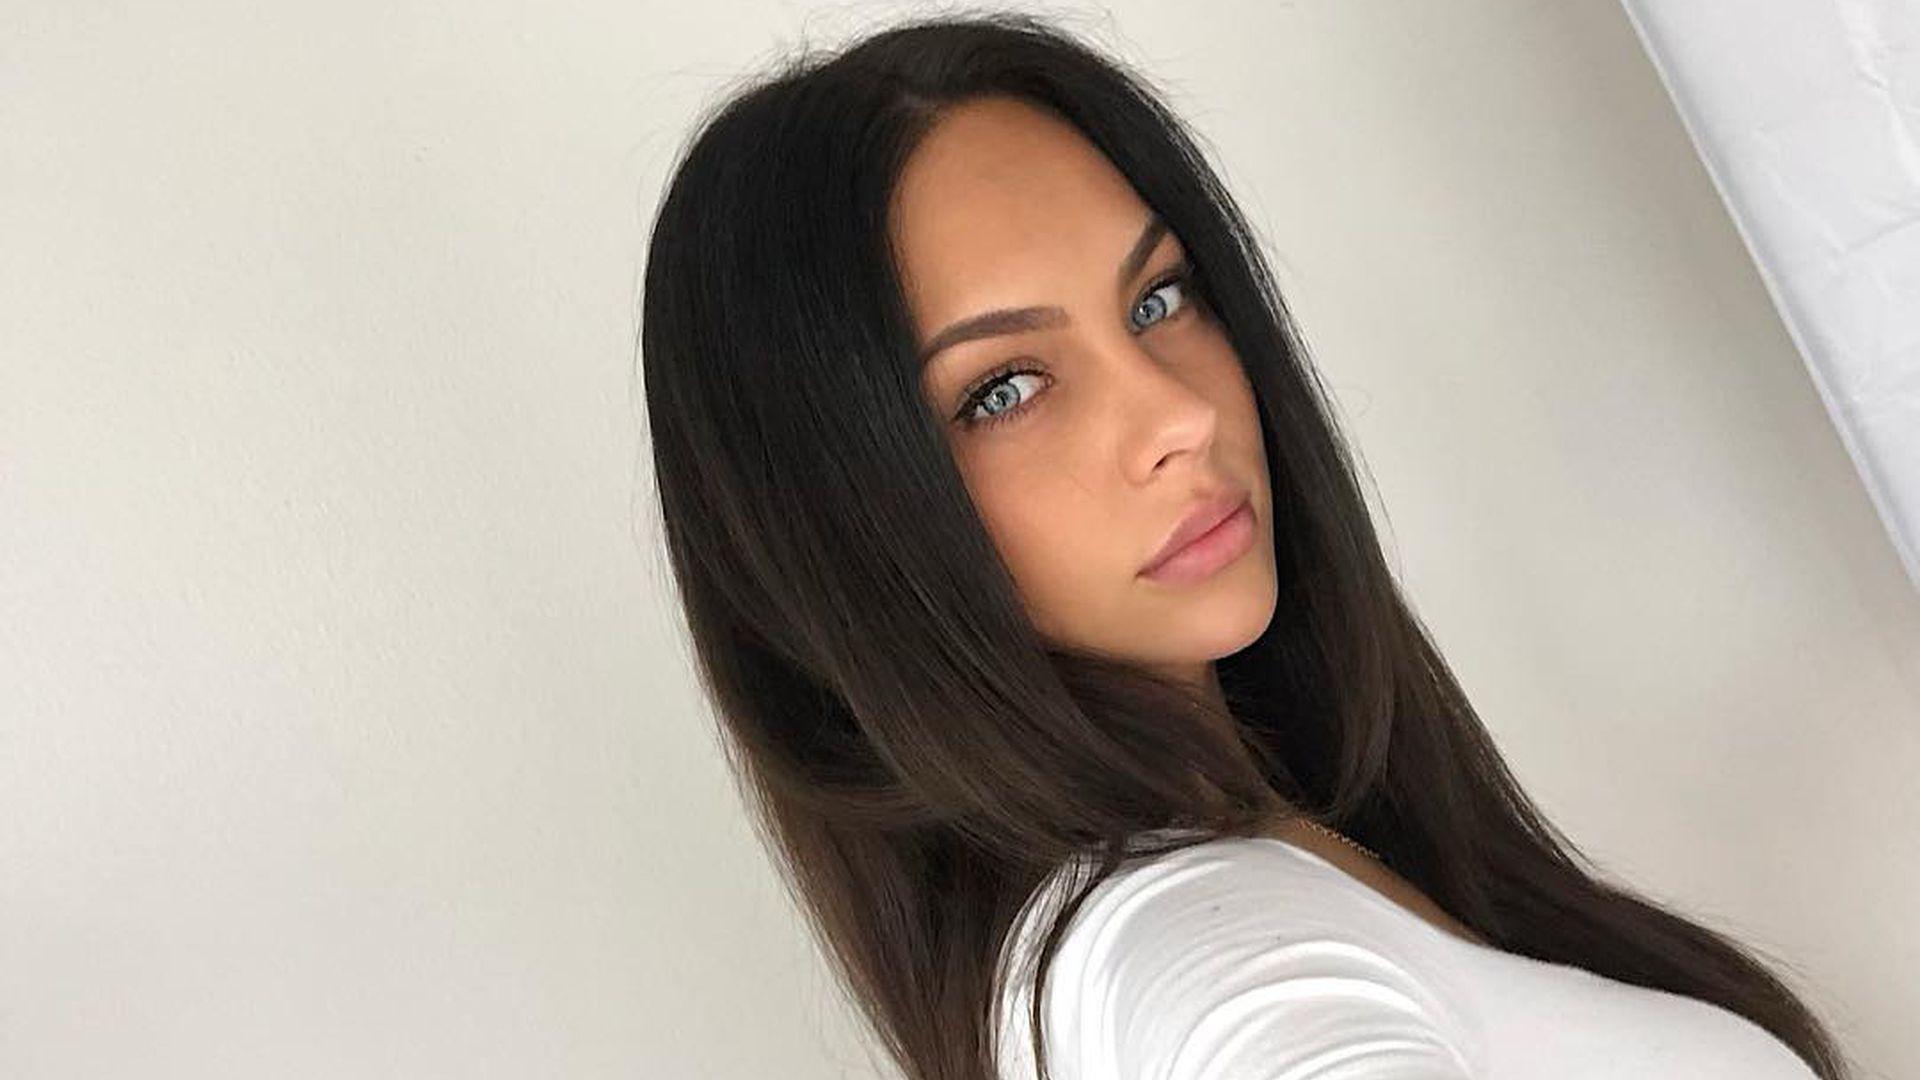 Netz-Tribute: Kasia Lenhardts Fans trauern auf Social Media - Promiflash.de